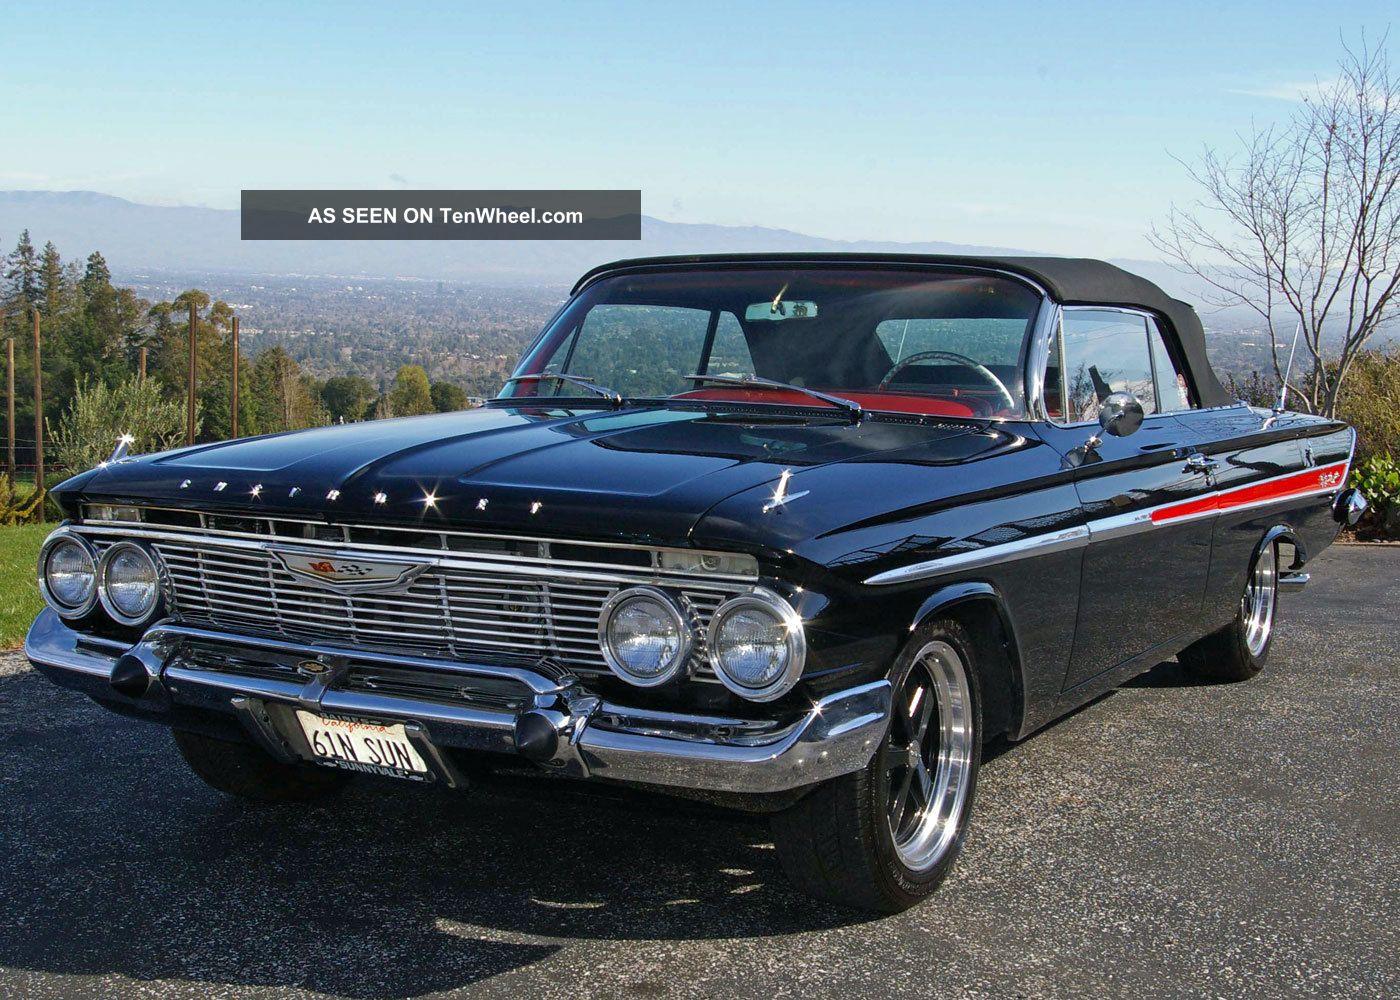 1961 Chevrolet Impala Ss Convertible 1964 Wiring Diagram